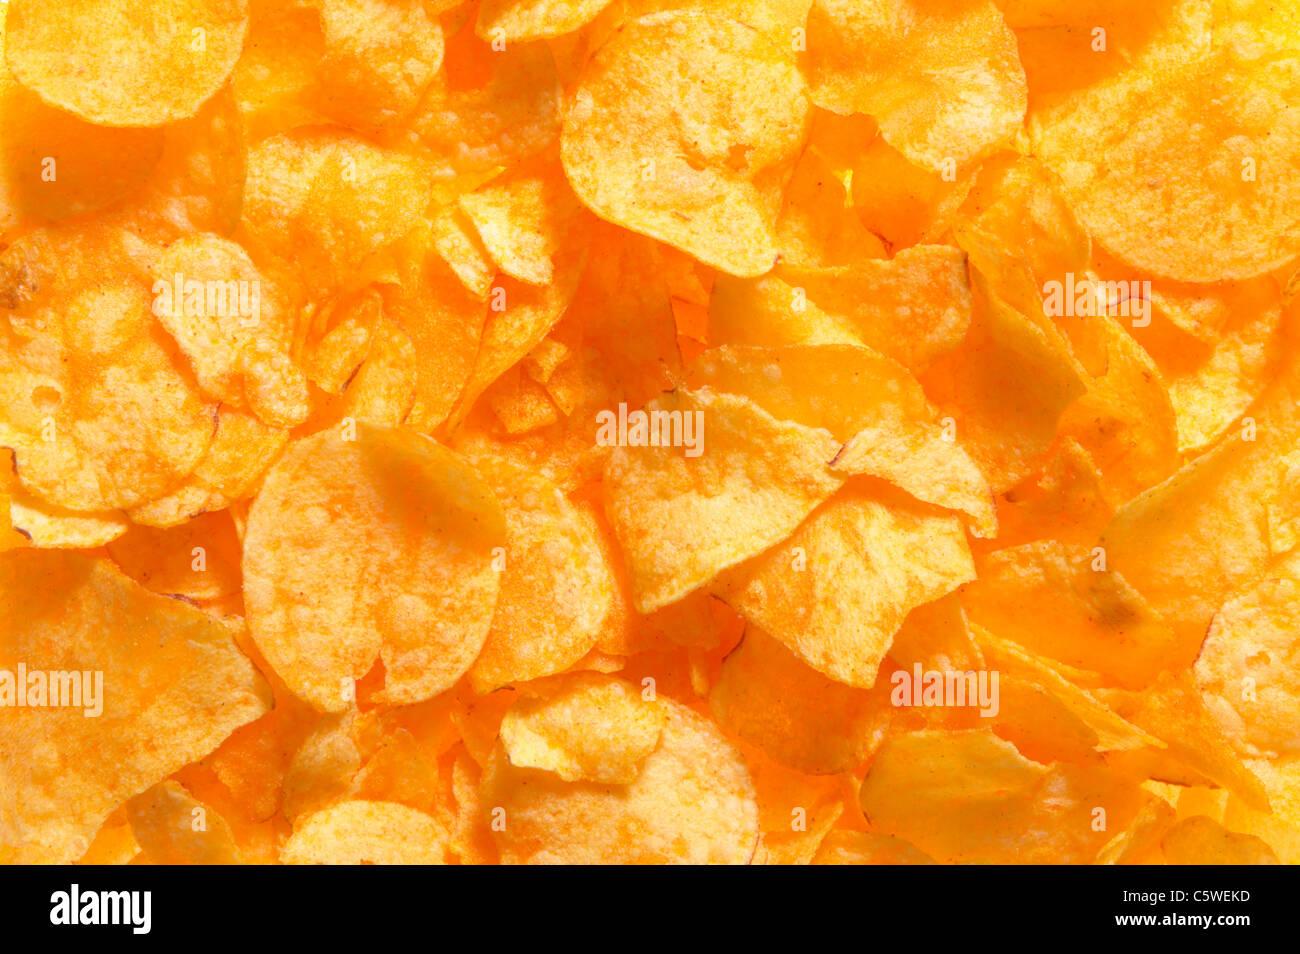 Patatas fritas, full frame, close-up Imagen De Stock